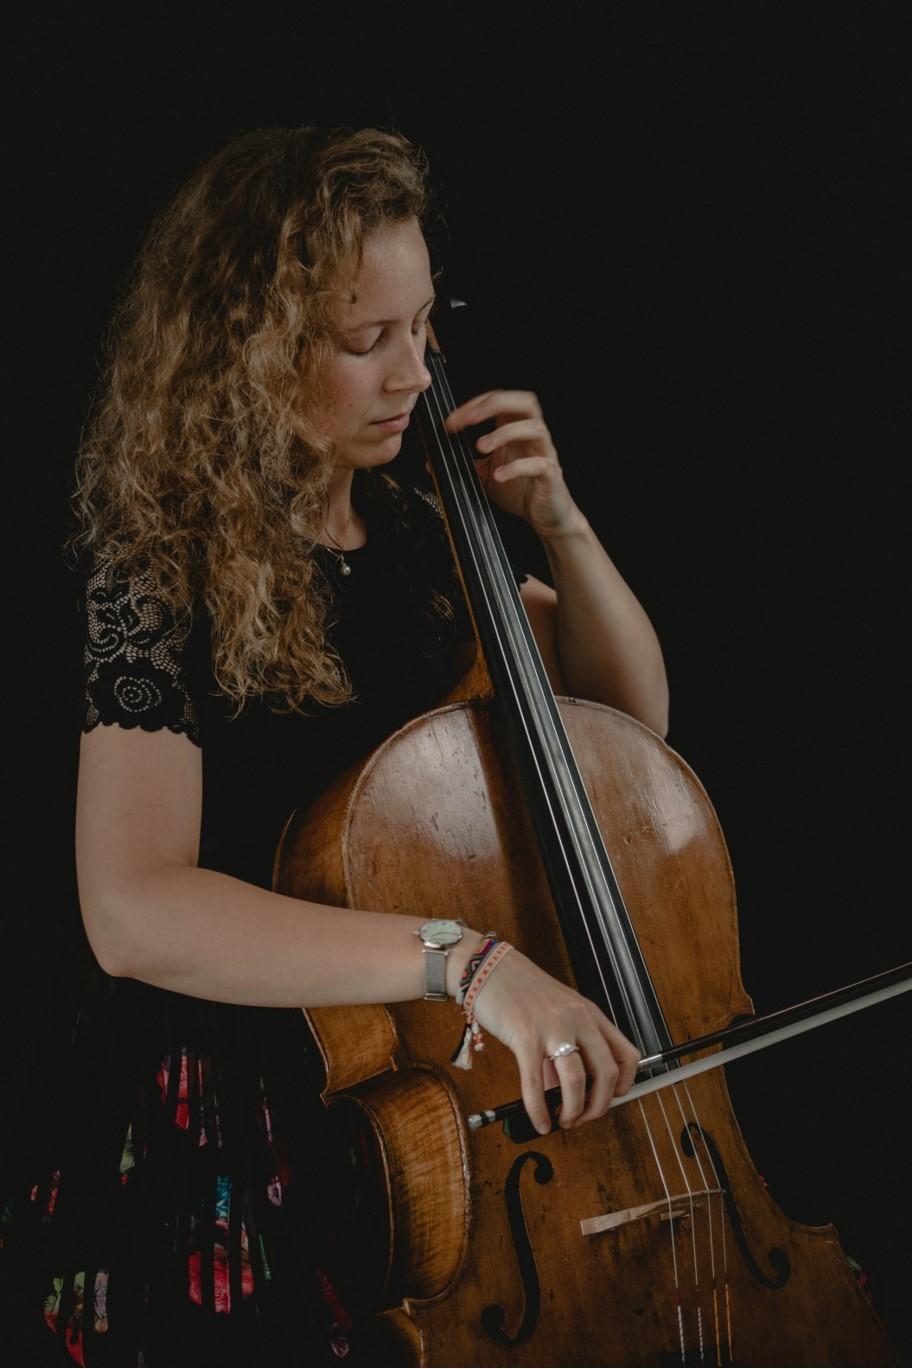 Zomerconcert in De Kleine Kerk: Charlotte Gulikers, cello